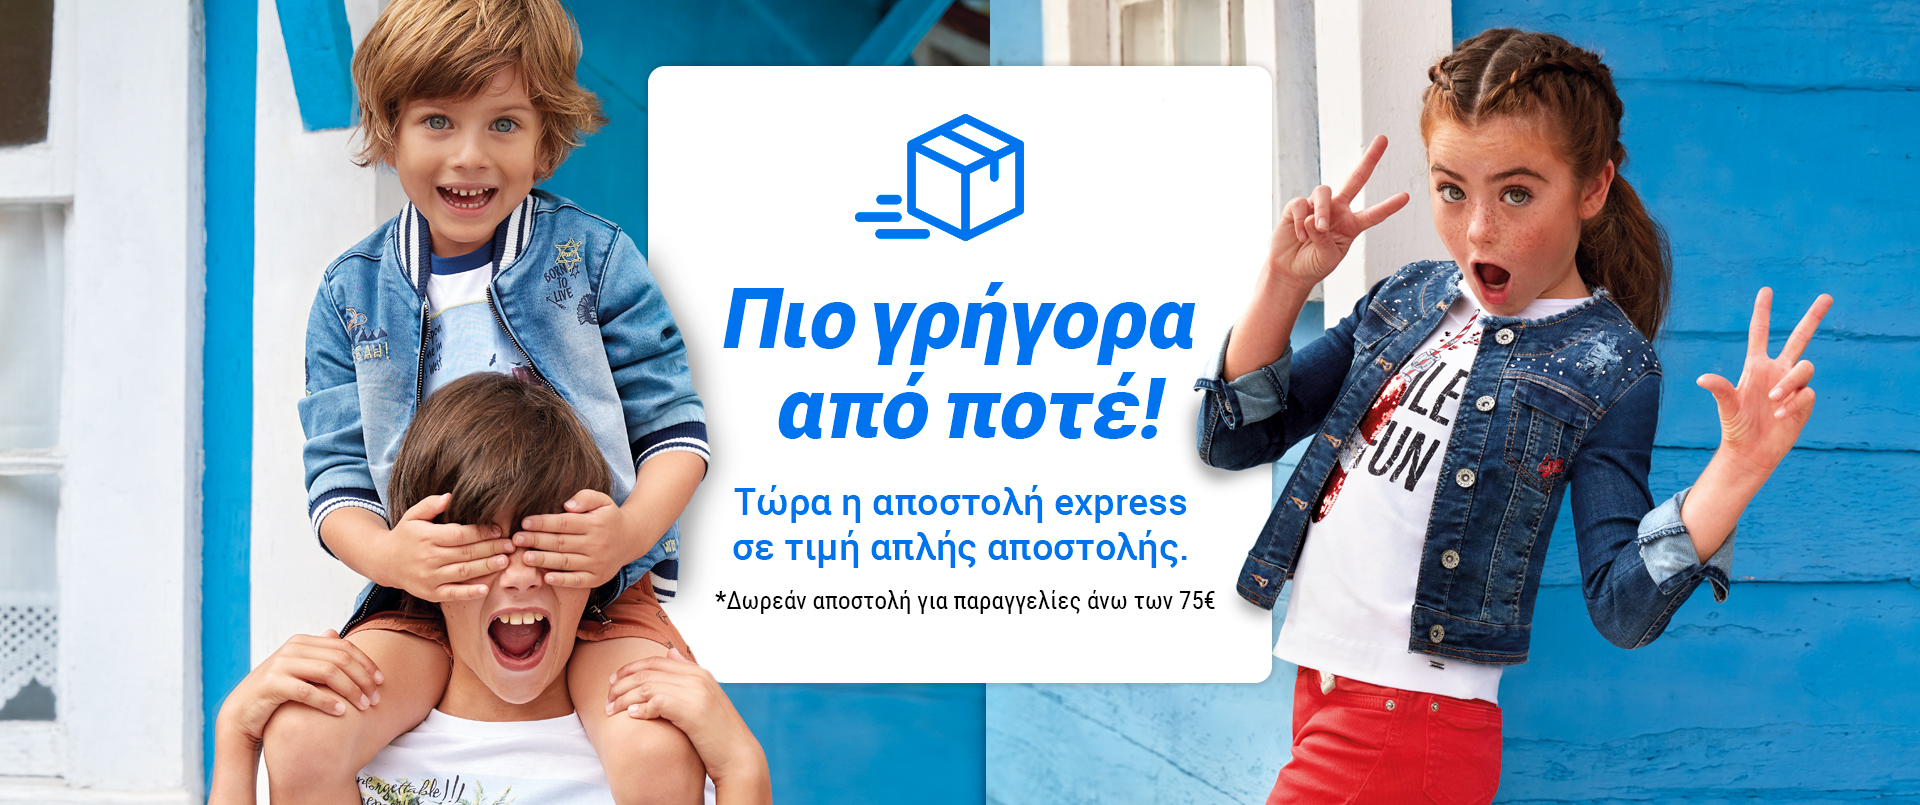 5347921084c Παιδική μόδα, ρούχα για μωρό, αγόρι και κορίτσι | Mayoral